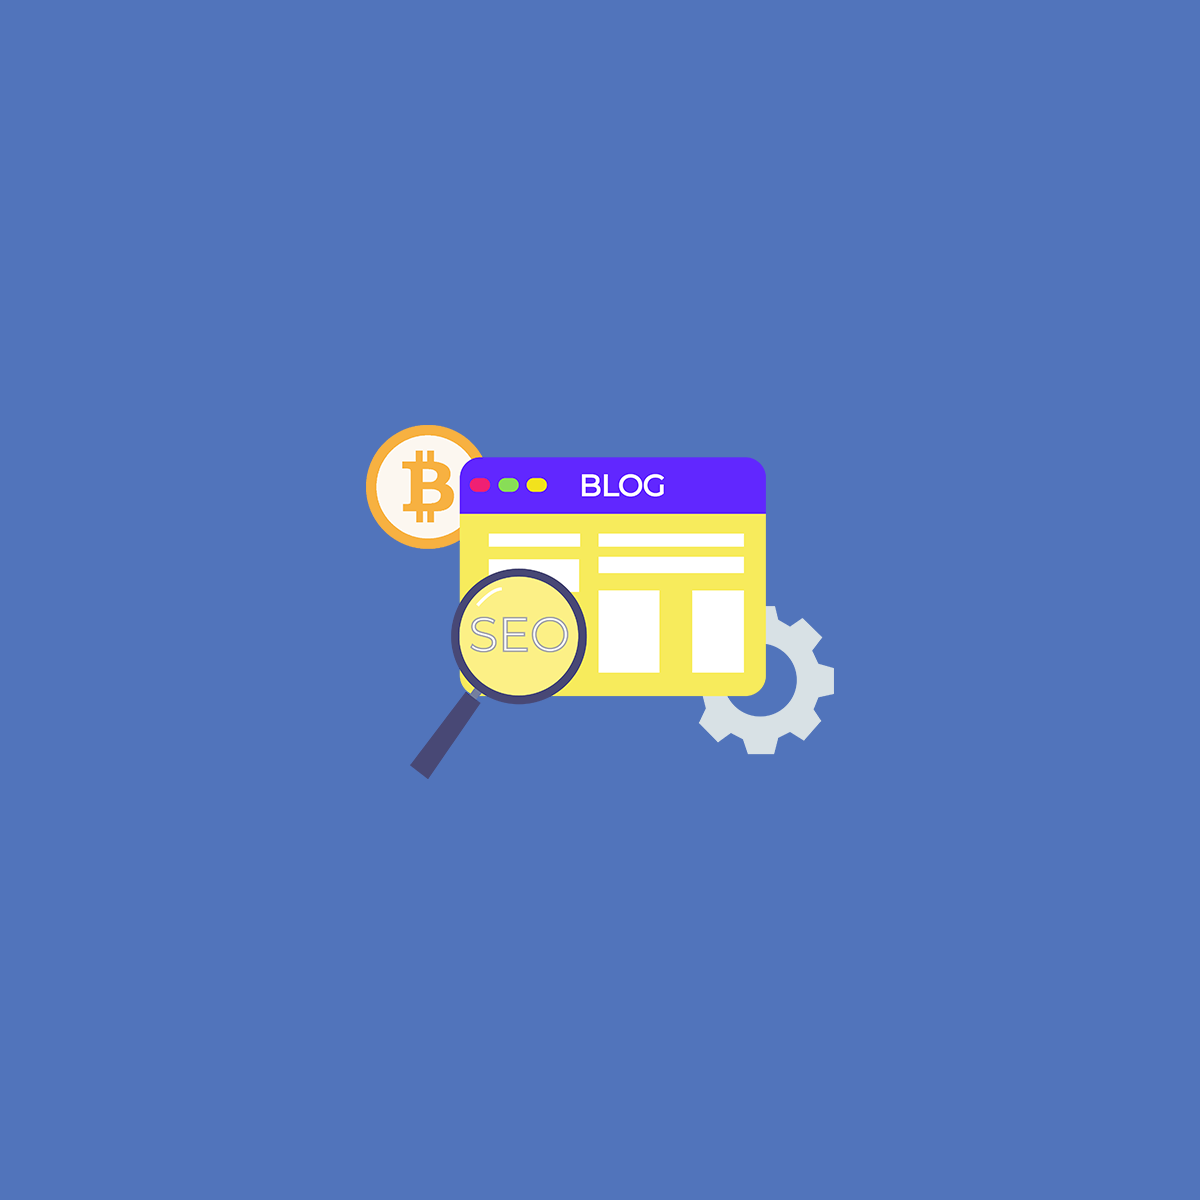 SEO optimized blog posts